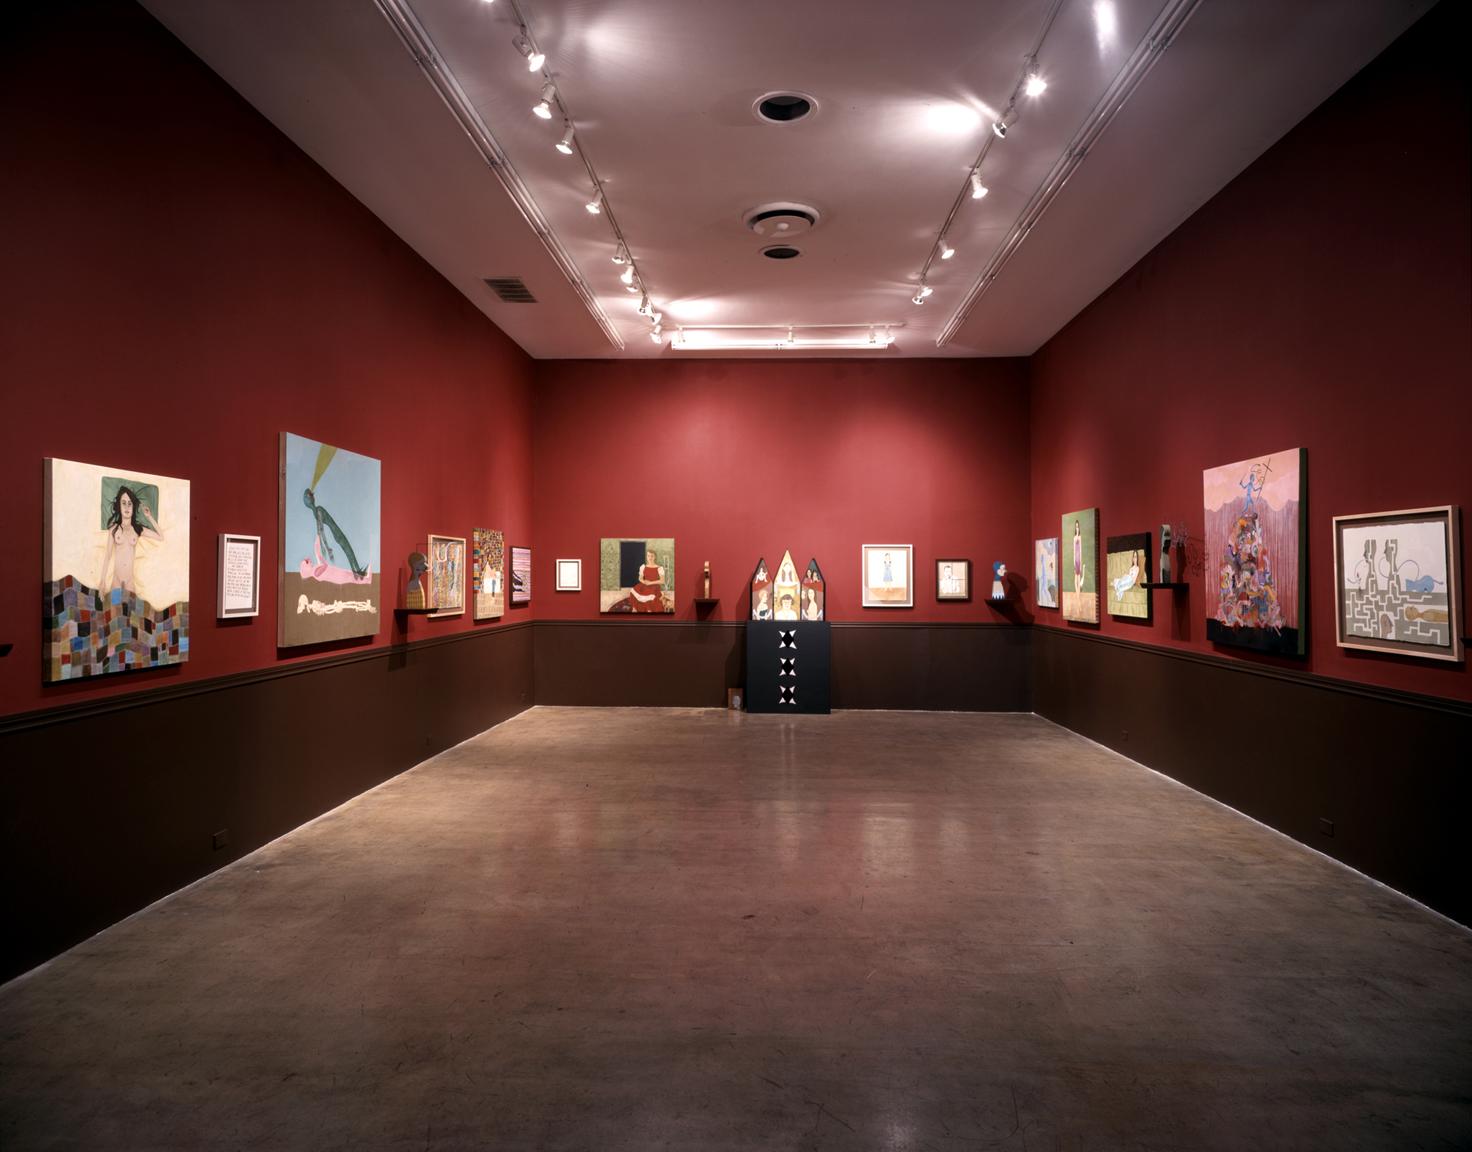 The Fogged Mirror, gallery installation at Roberts & Tilton